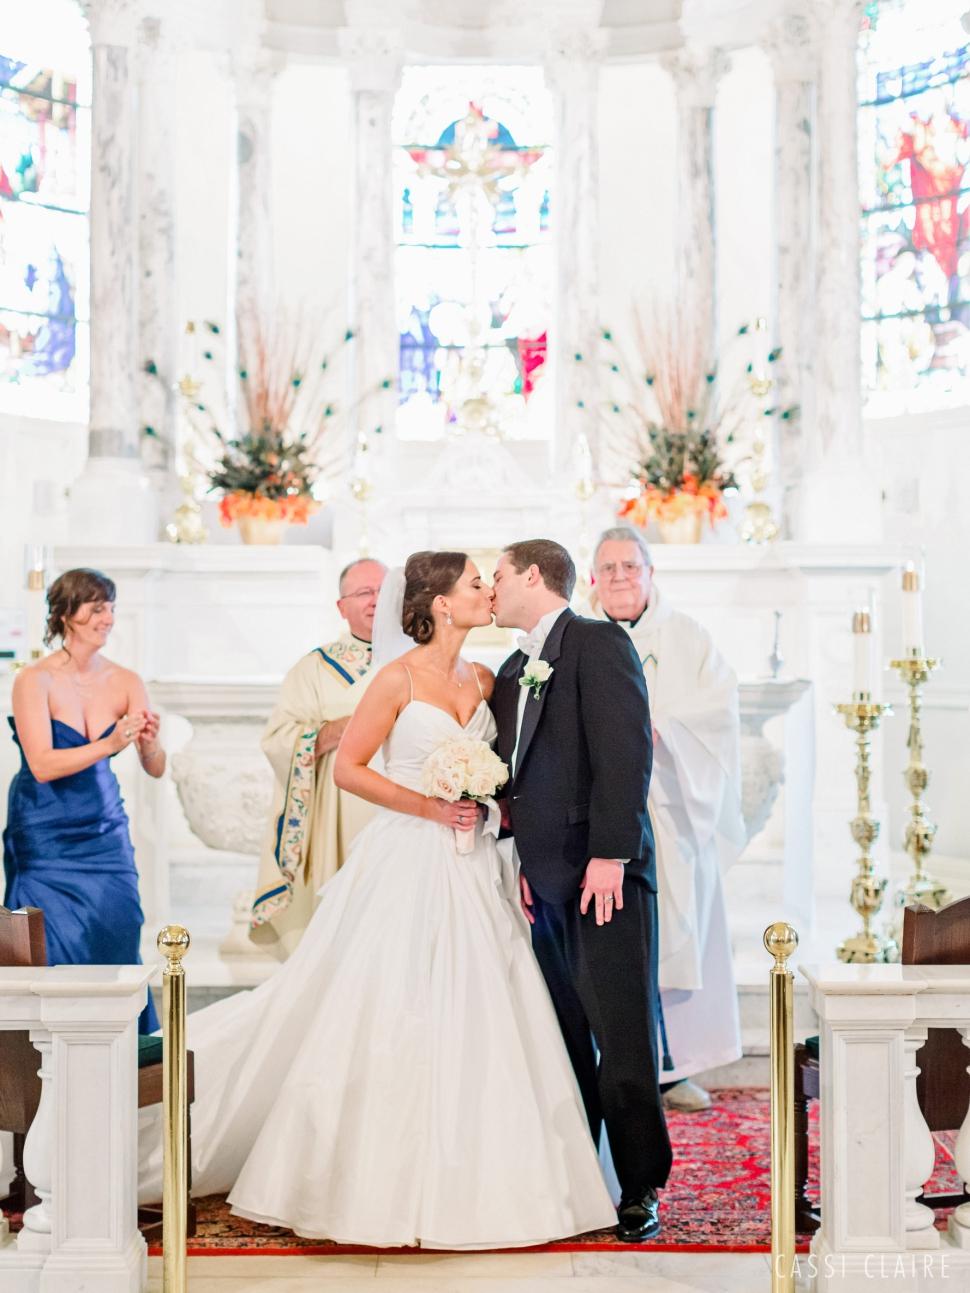 Spring-Lake-Bath-and-Tennis-Club-Wedding-Photos-St-Catherines-Wedding-New-Jersey_13.jpg